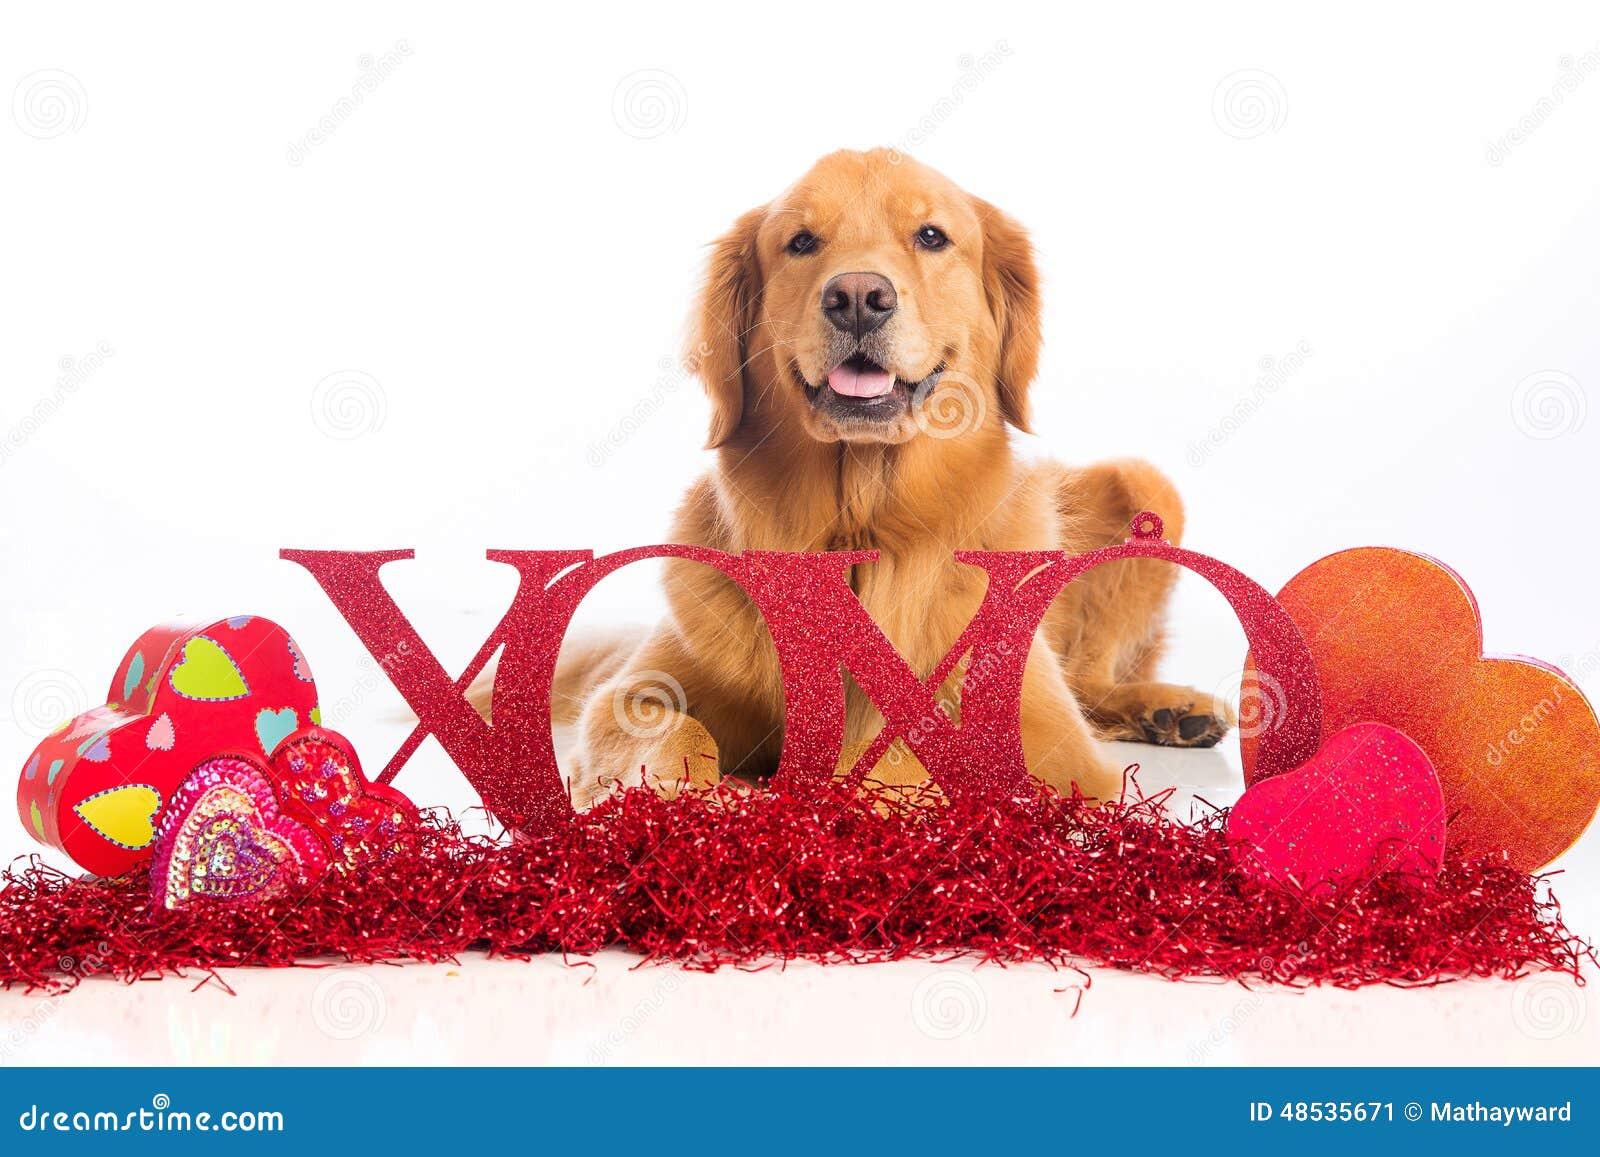 Xoxo Golden Retriever Dog On Valentines Day Stock Image Image Of